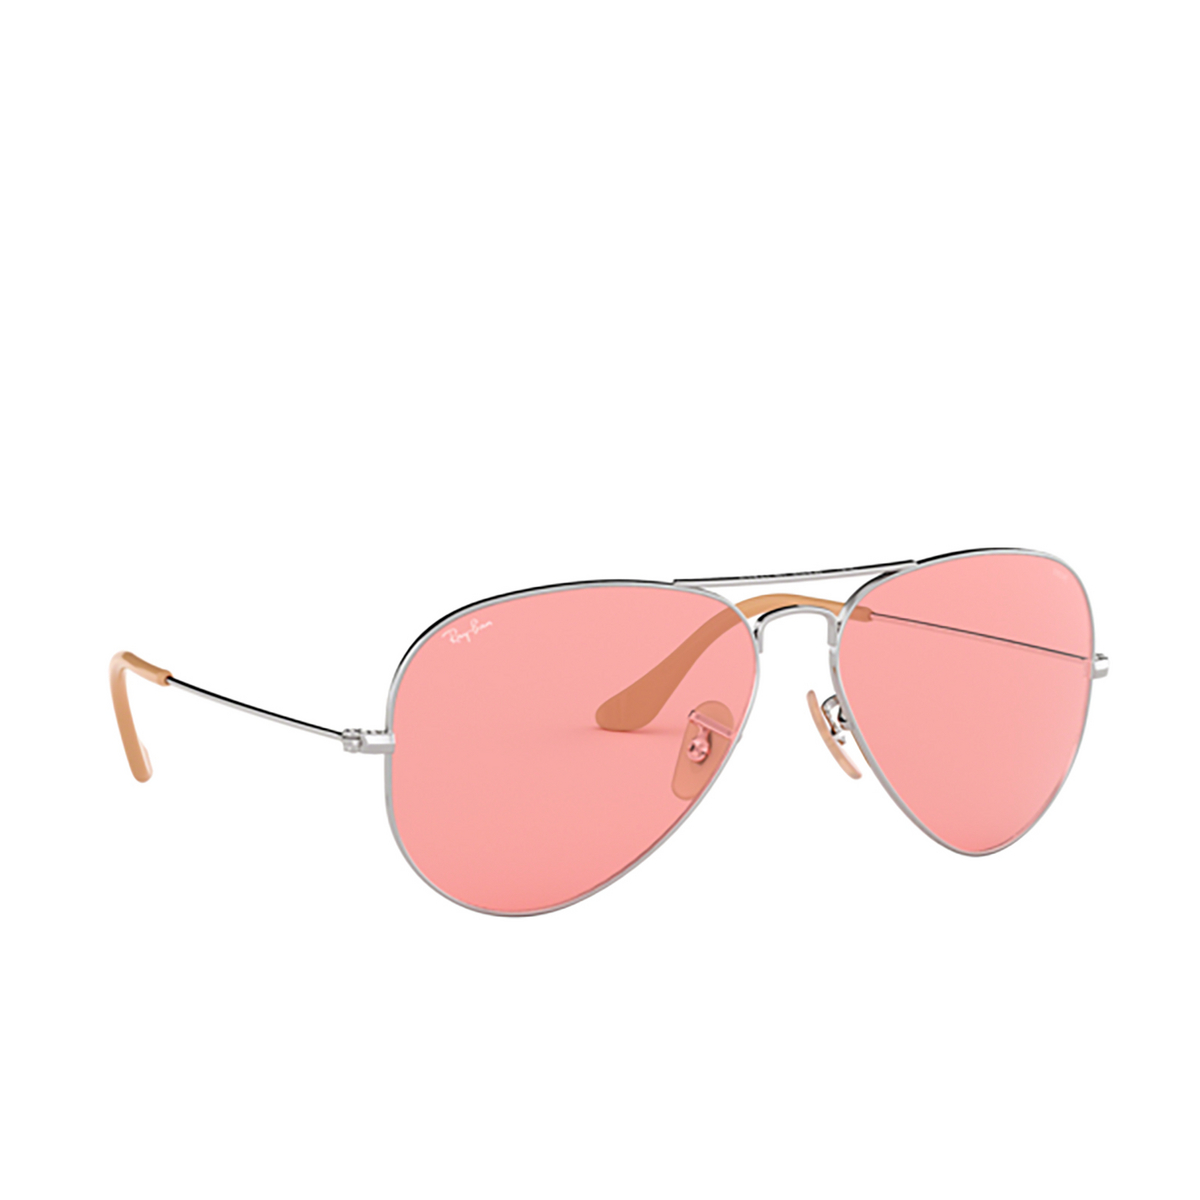 Ray-Ban® Aviator Sunglasses: Aviator Large Metal RB3025 color Silver 9065V7.